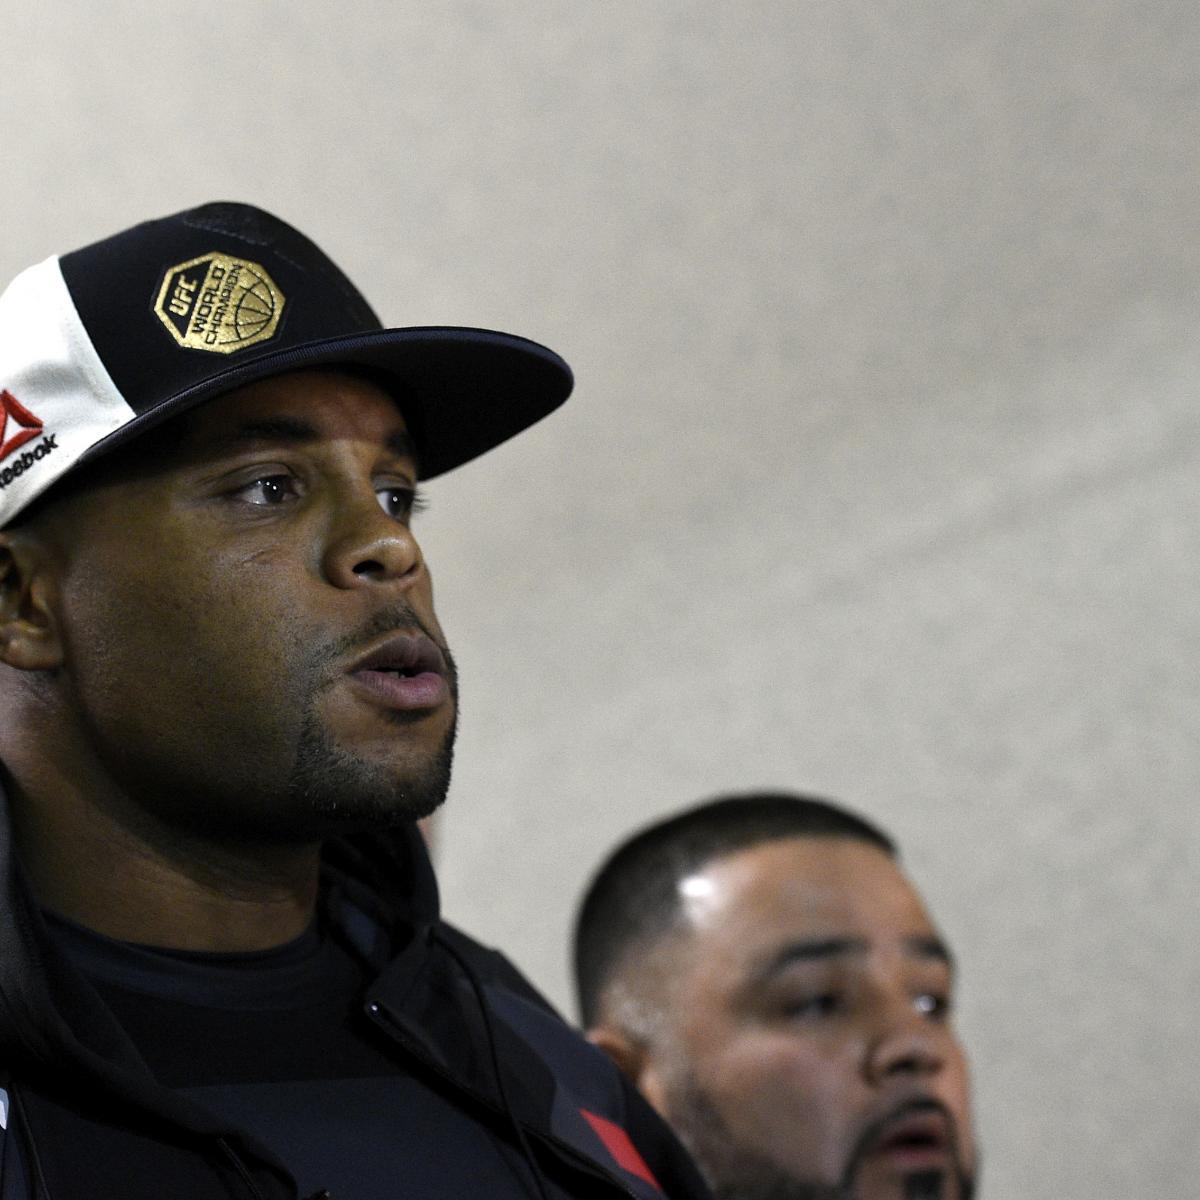 Daniel Cormier 'Very Emotional' over Jon Jones' Potential UFC 214 Drug Violation